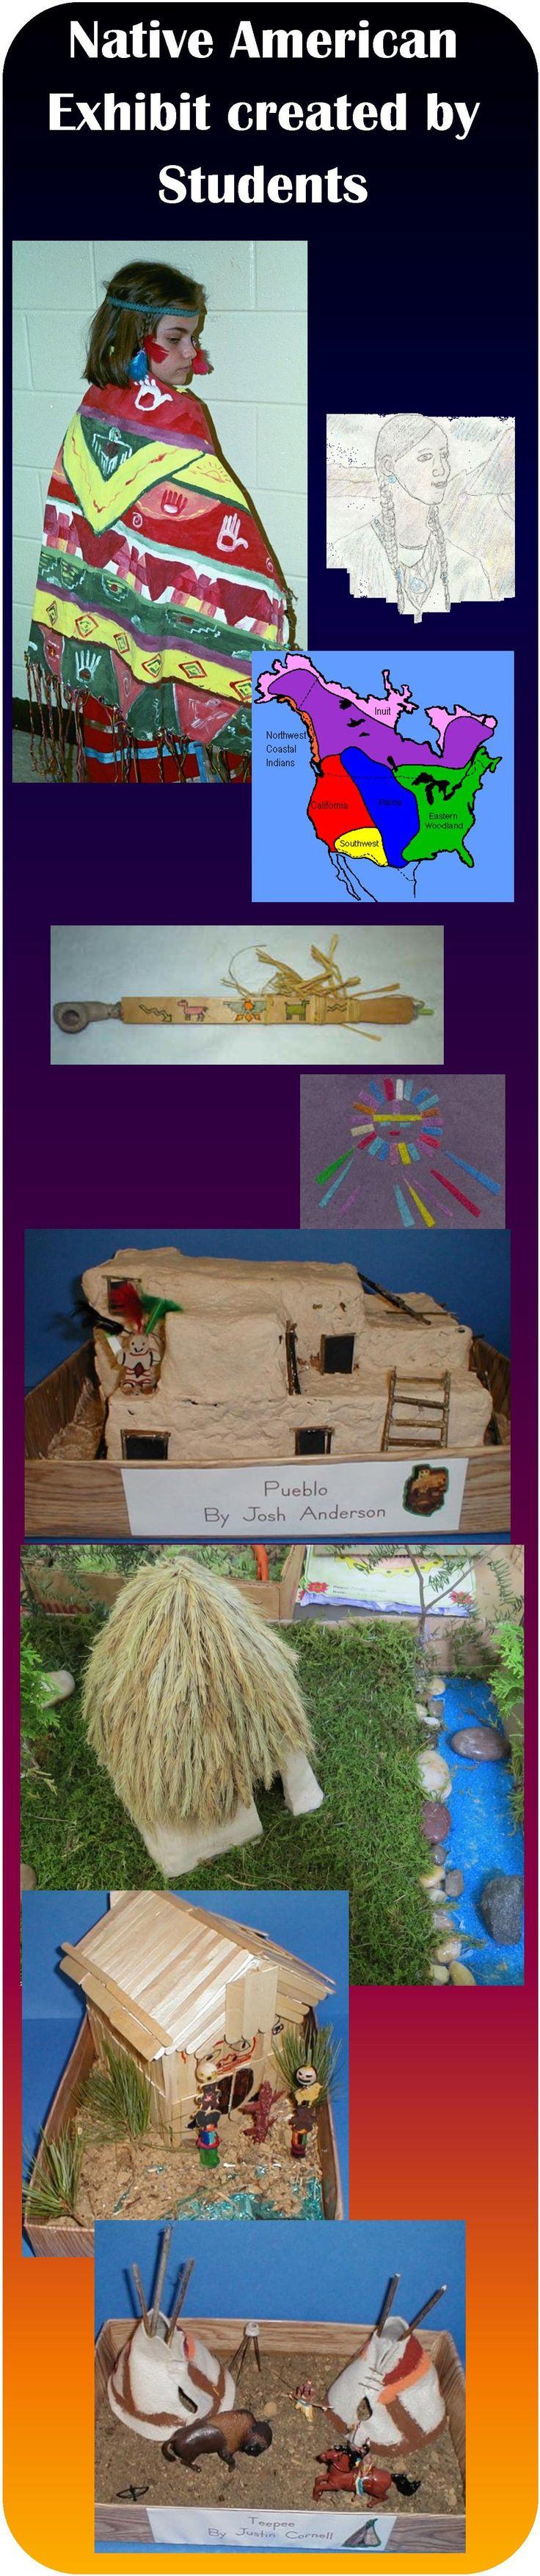 17 best images about pueblo school project on pinterest for How to build a model pueblo house